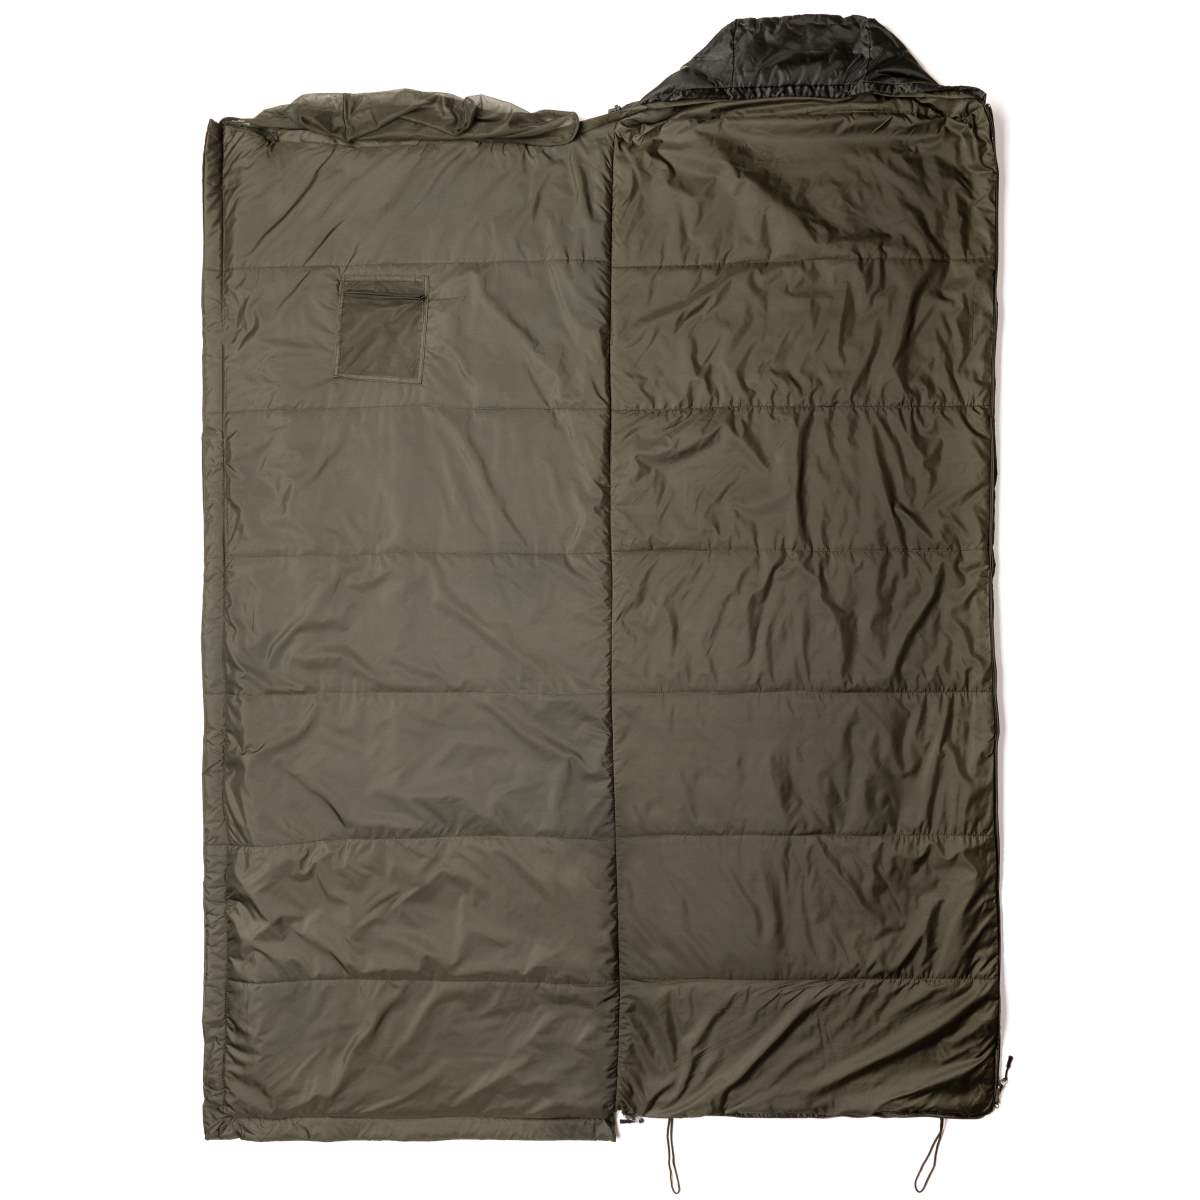 COMPRESSION SACK JUNGLE Sleeping Bag Summer//Lightweight//British//Army Grade 1